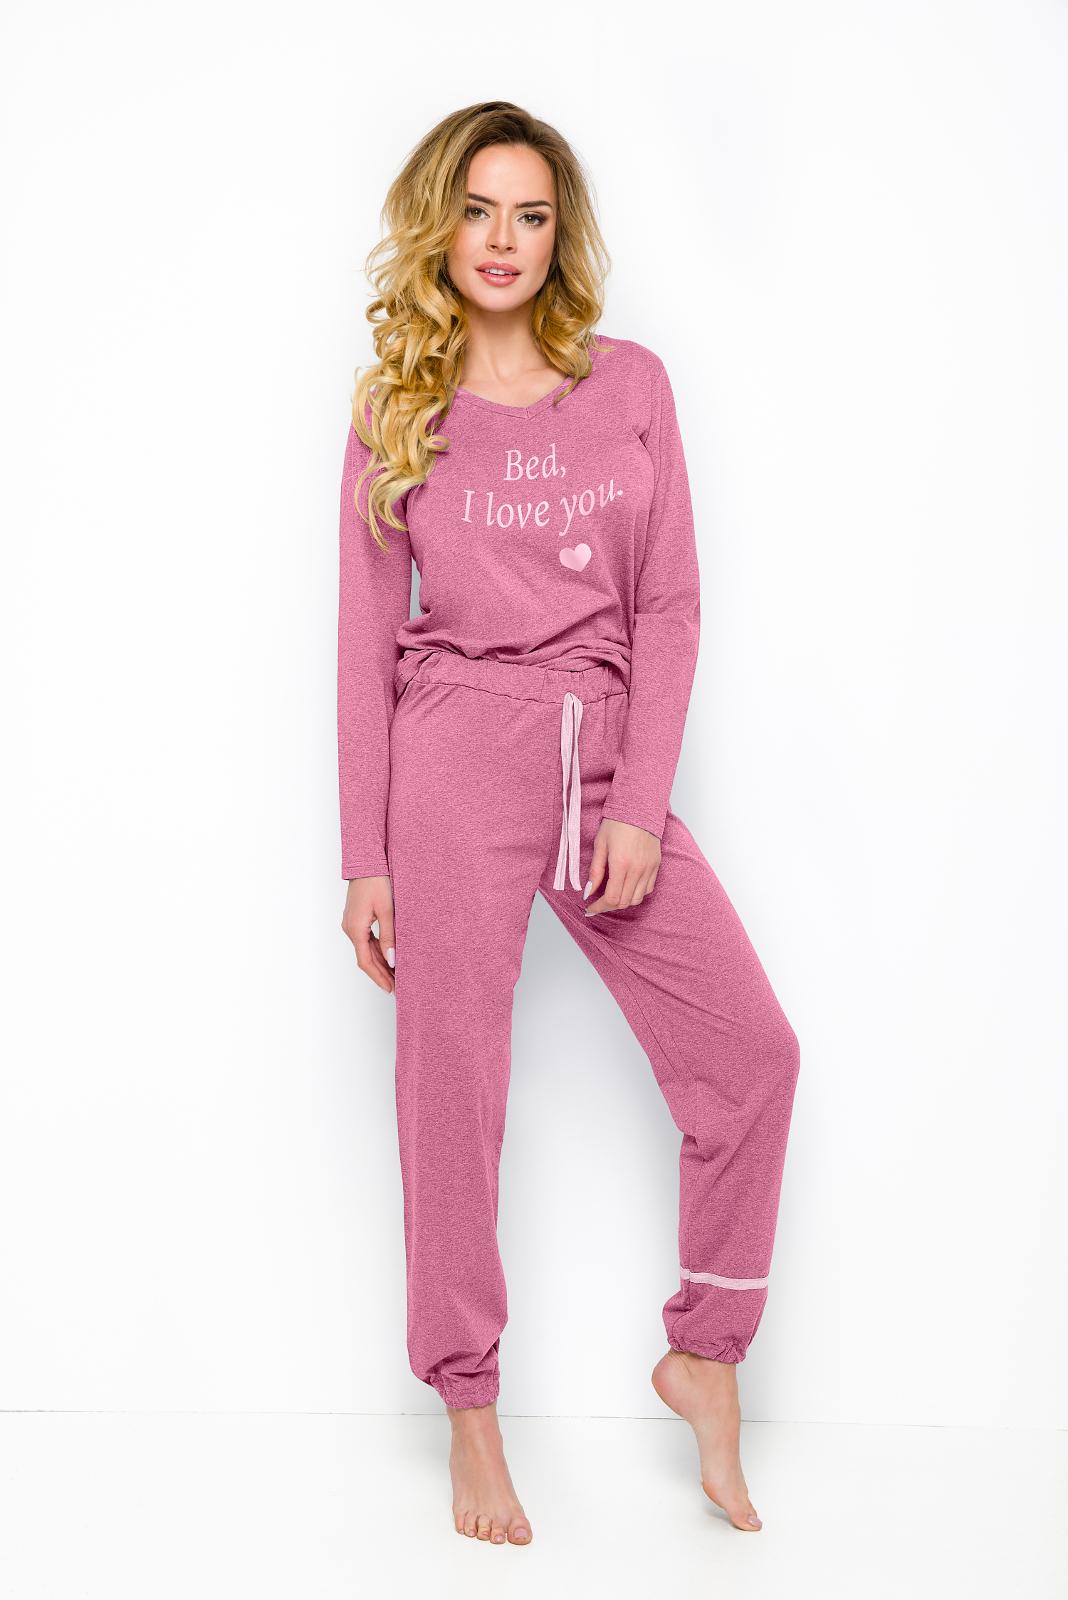 Piżama Taro Jula 2230 dł/r S-XL '19